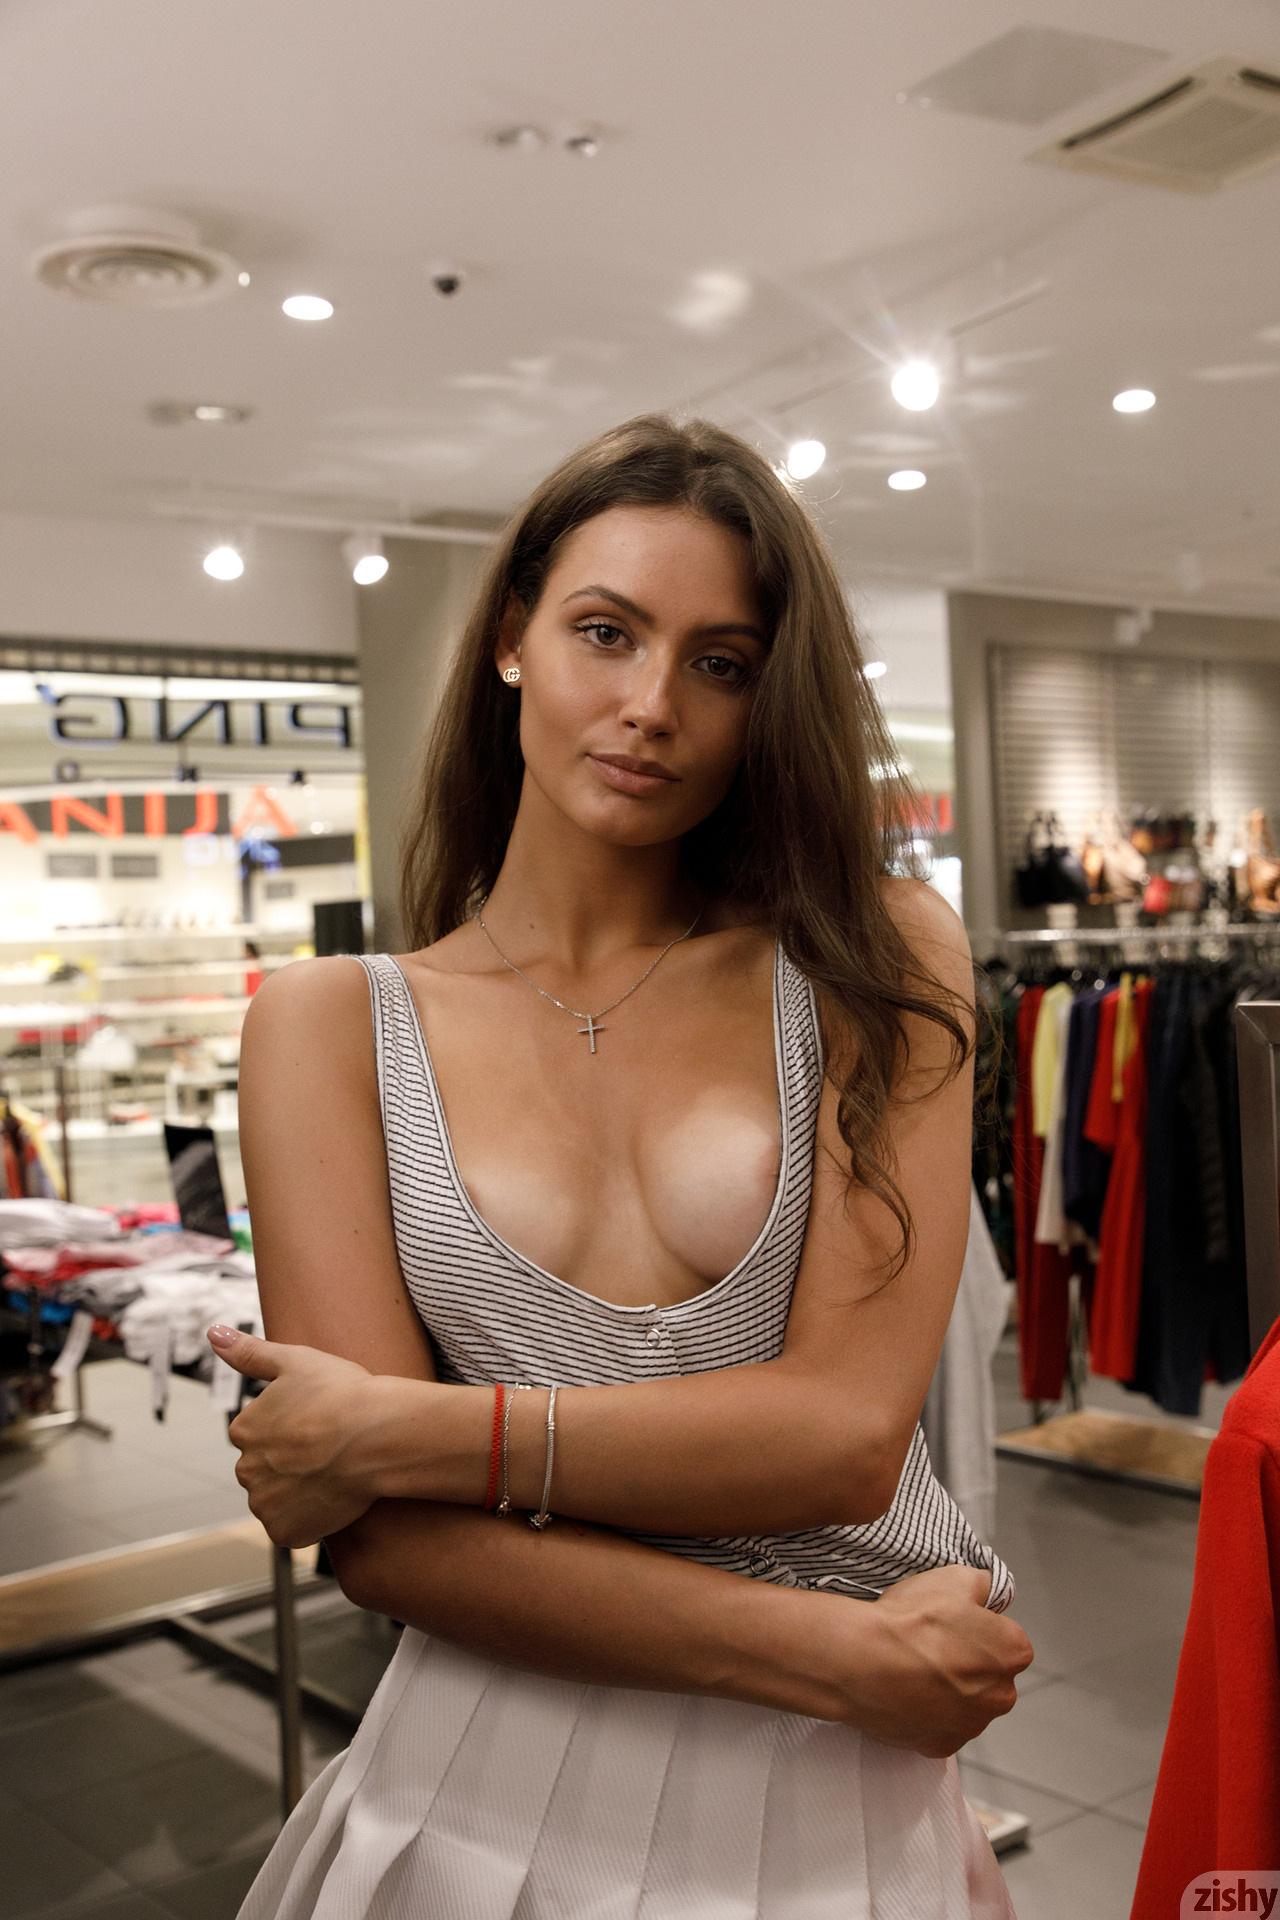 Shyla Volbeck Shopping With The Devil Zishy (84)